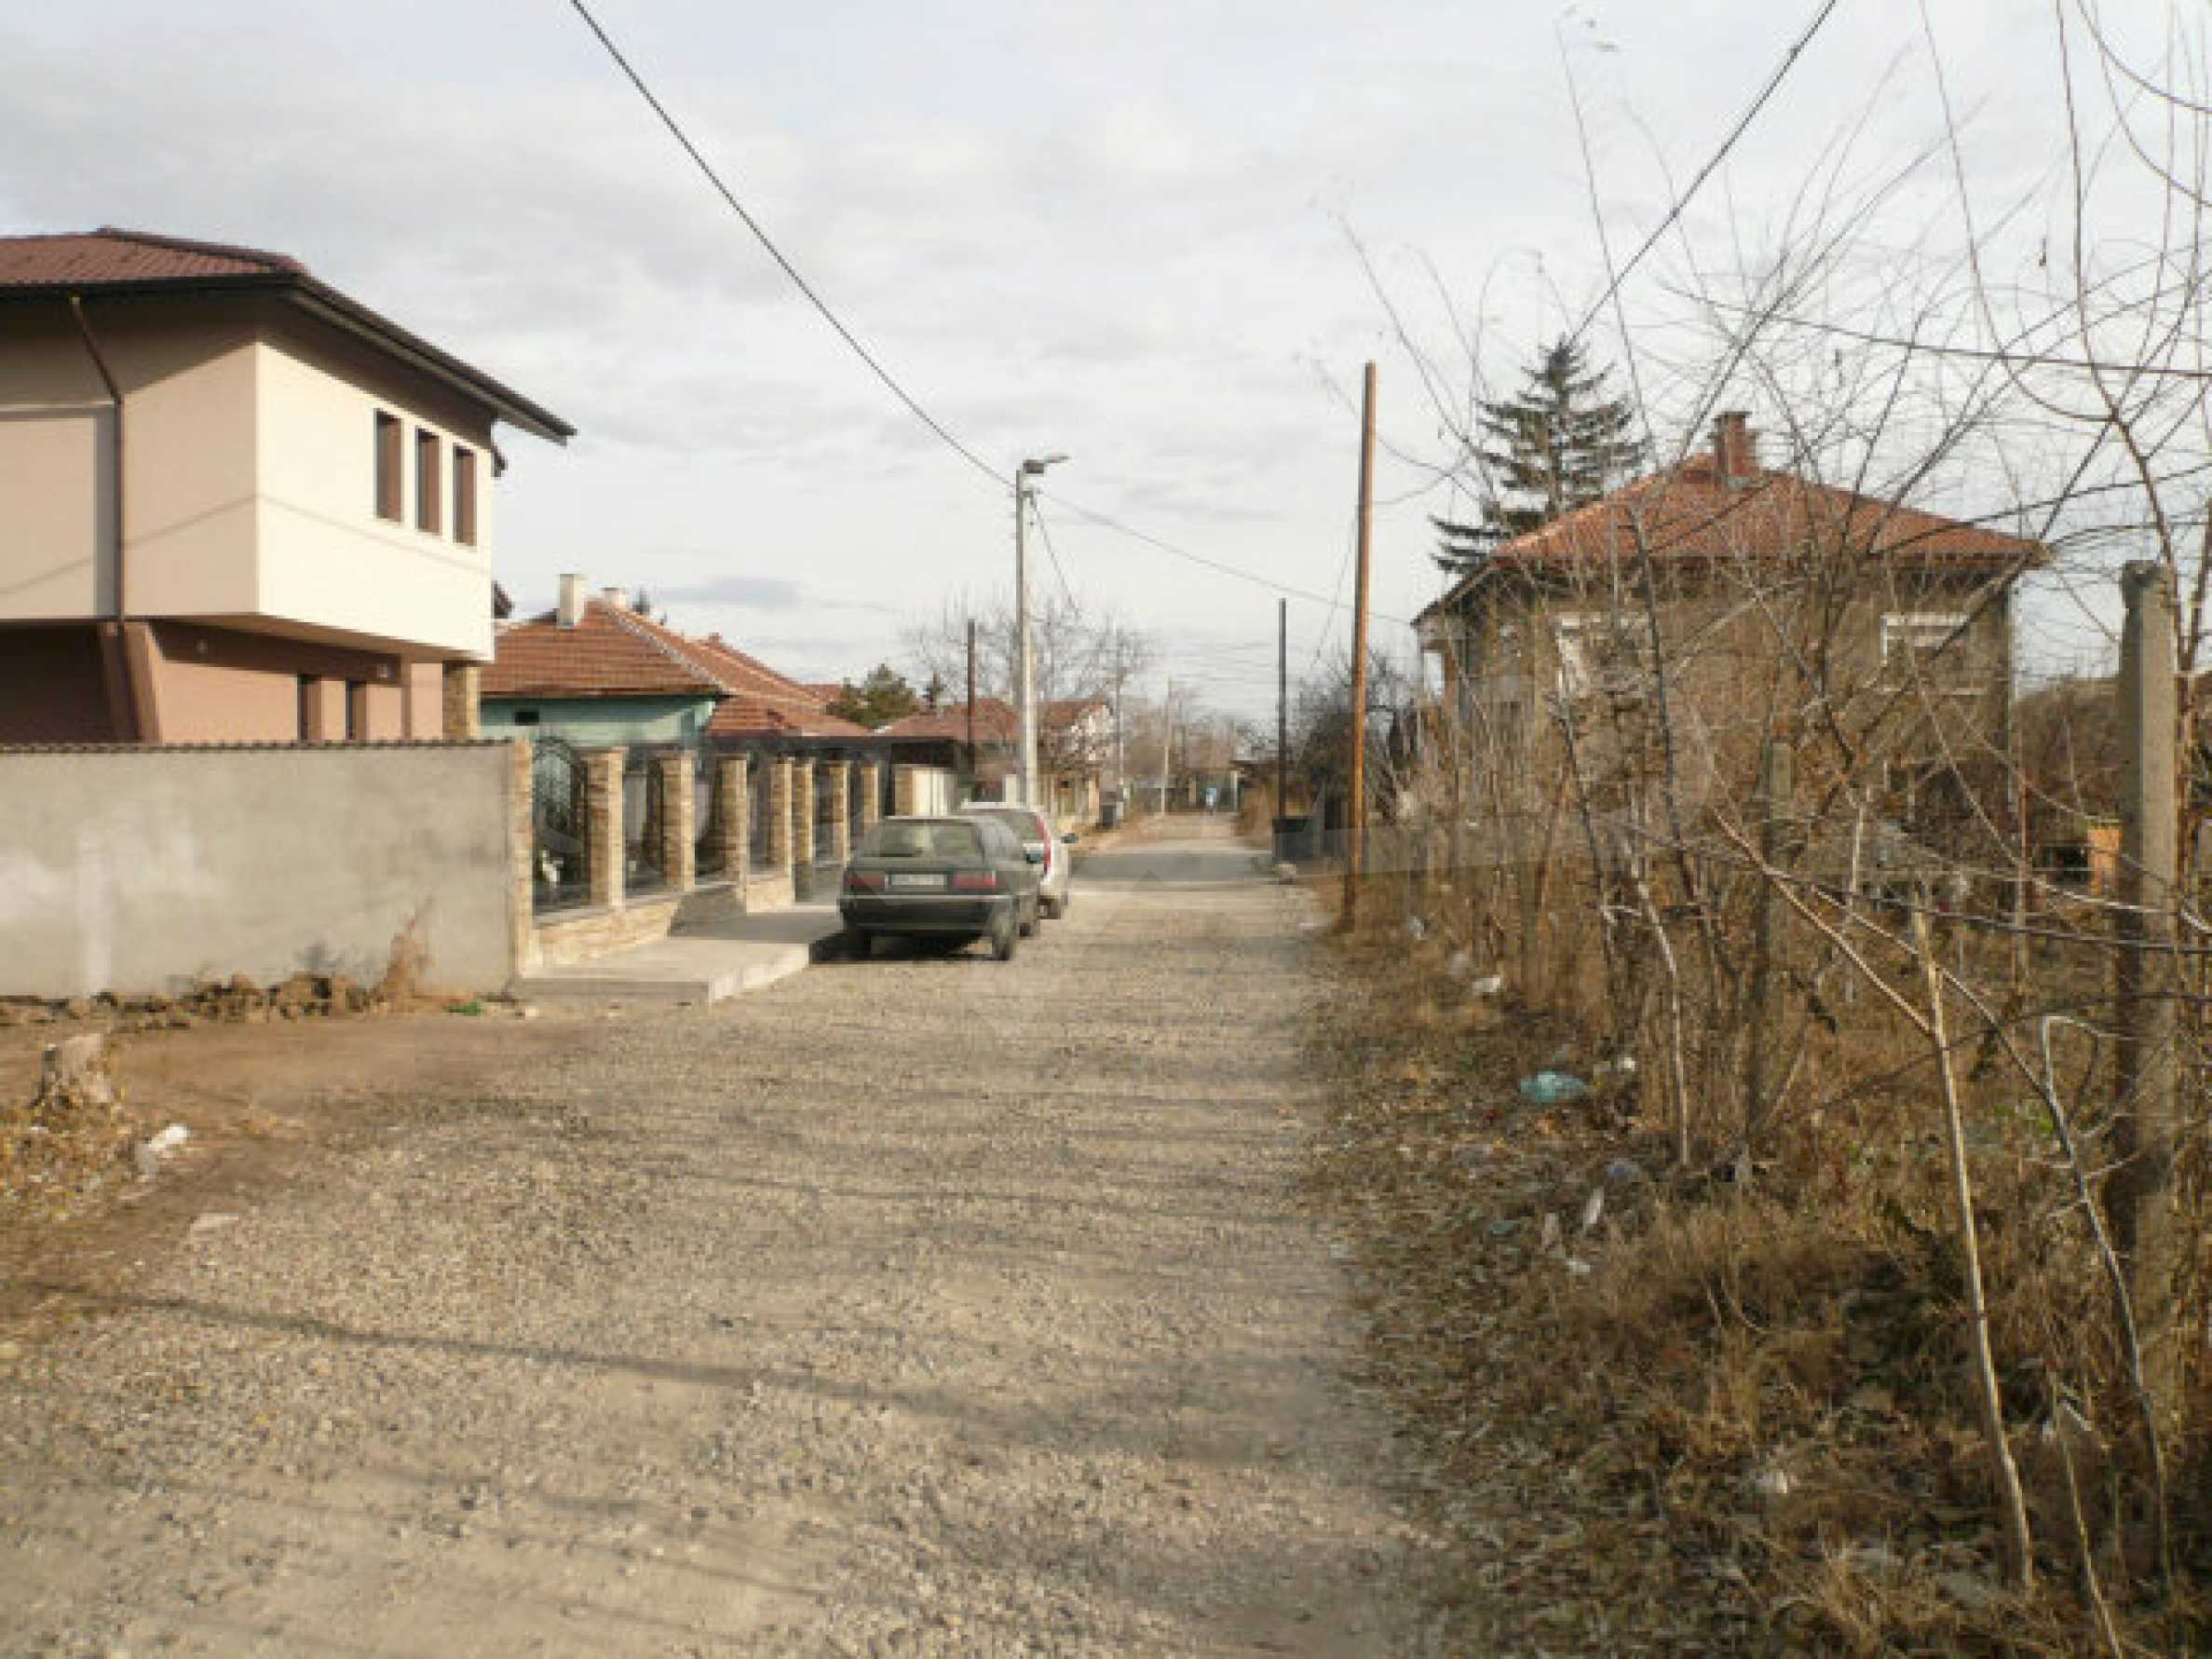 Участок под застройку дома в городе Видин 2